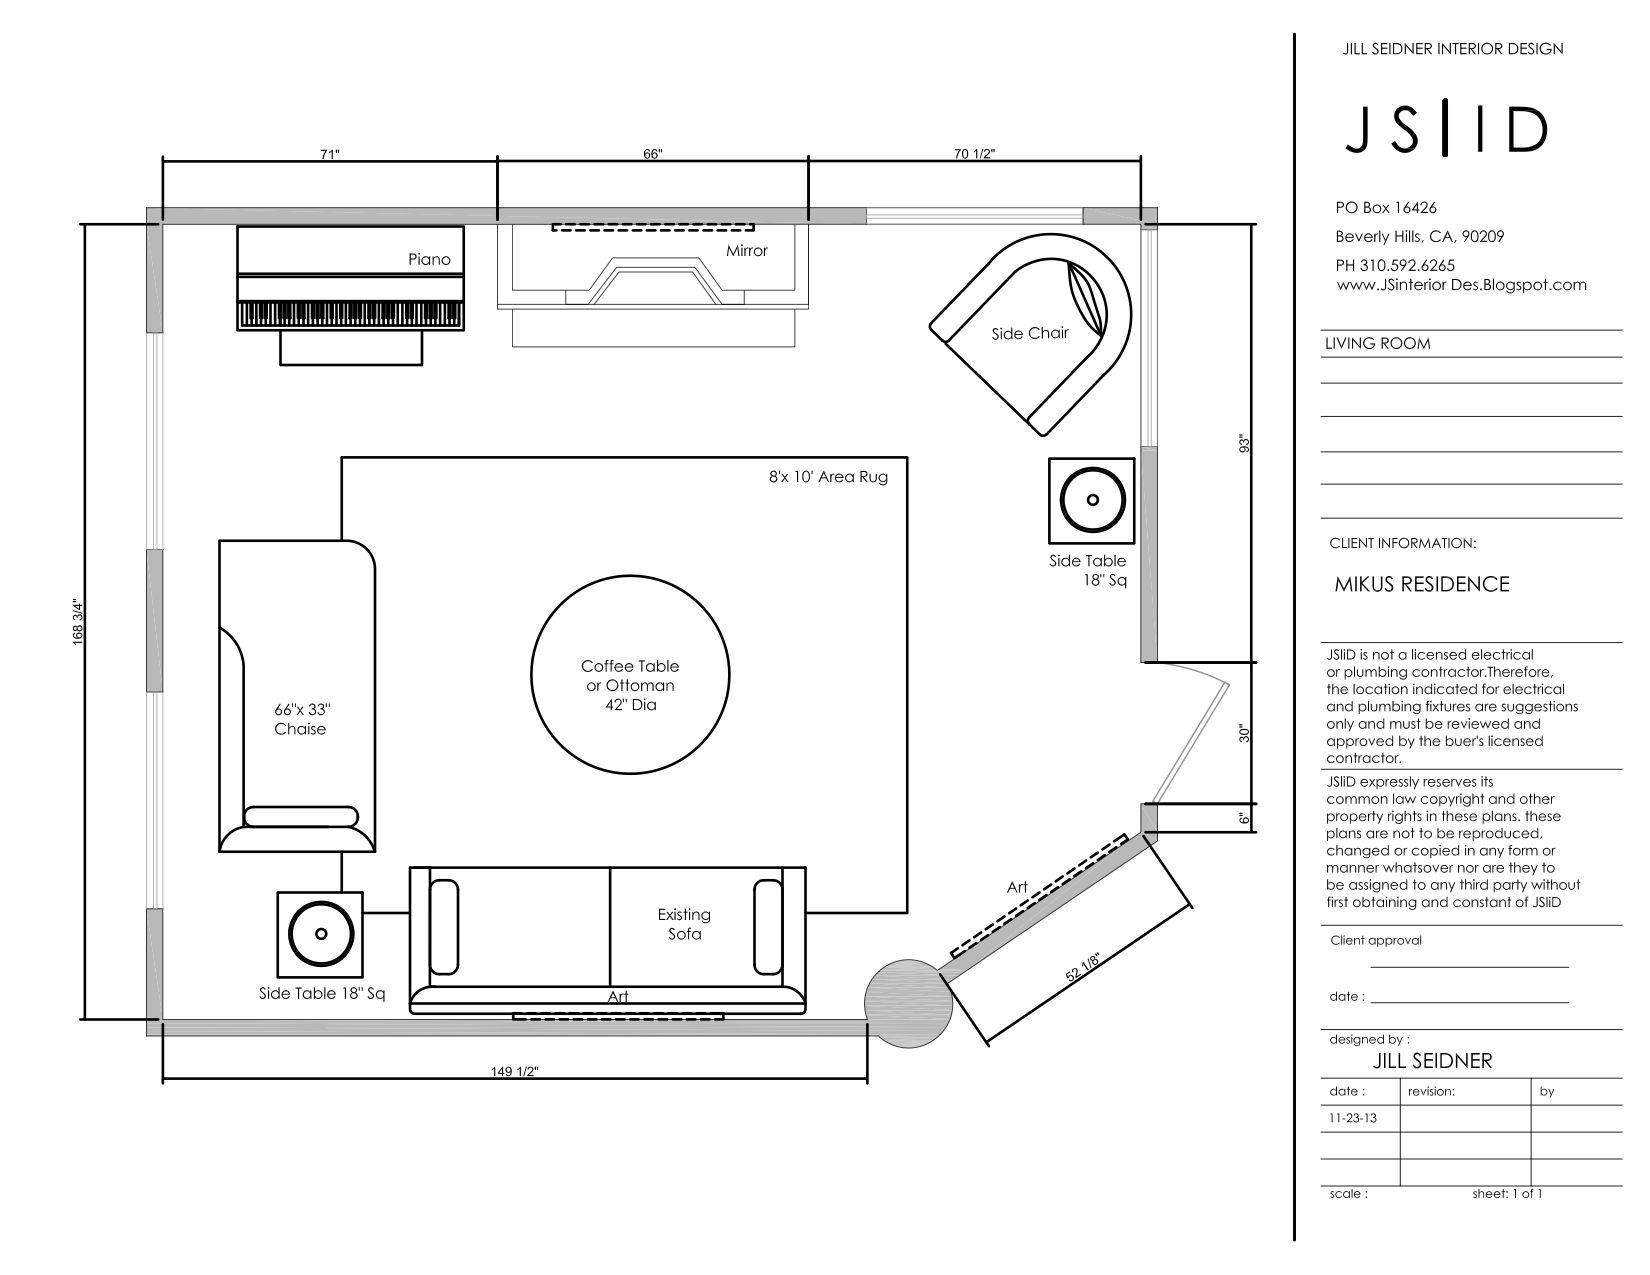 Online Design Project Living Room Furniture Floor Plan Layout Www Jsinteriordes Blogspot Com Floor Plan Layout Living Room Furniture Layout Furniture Layout